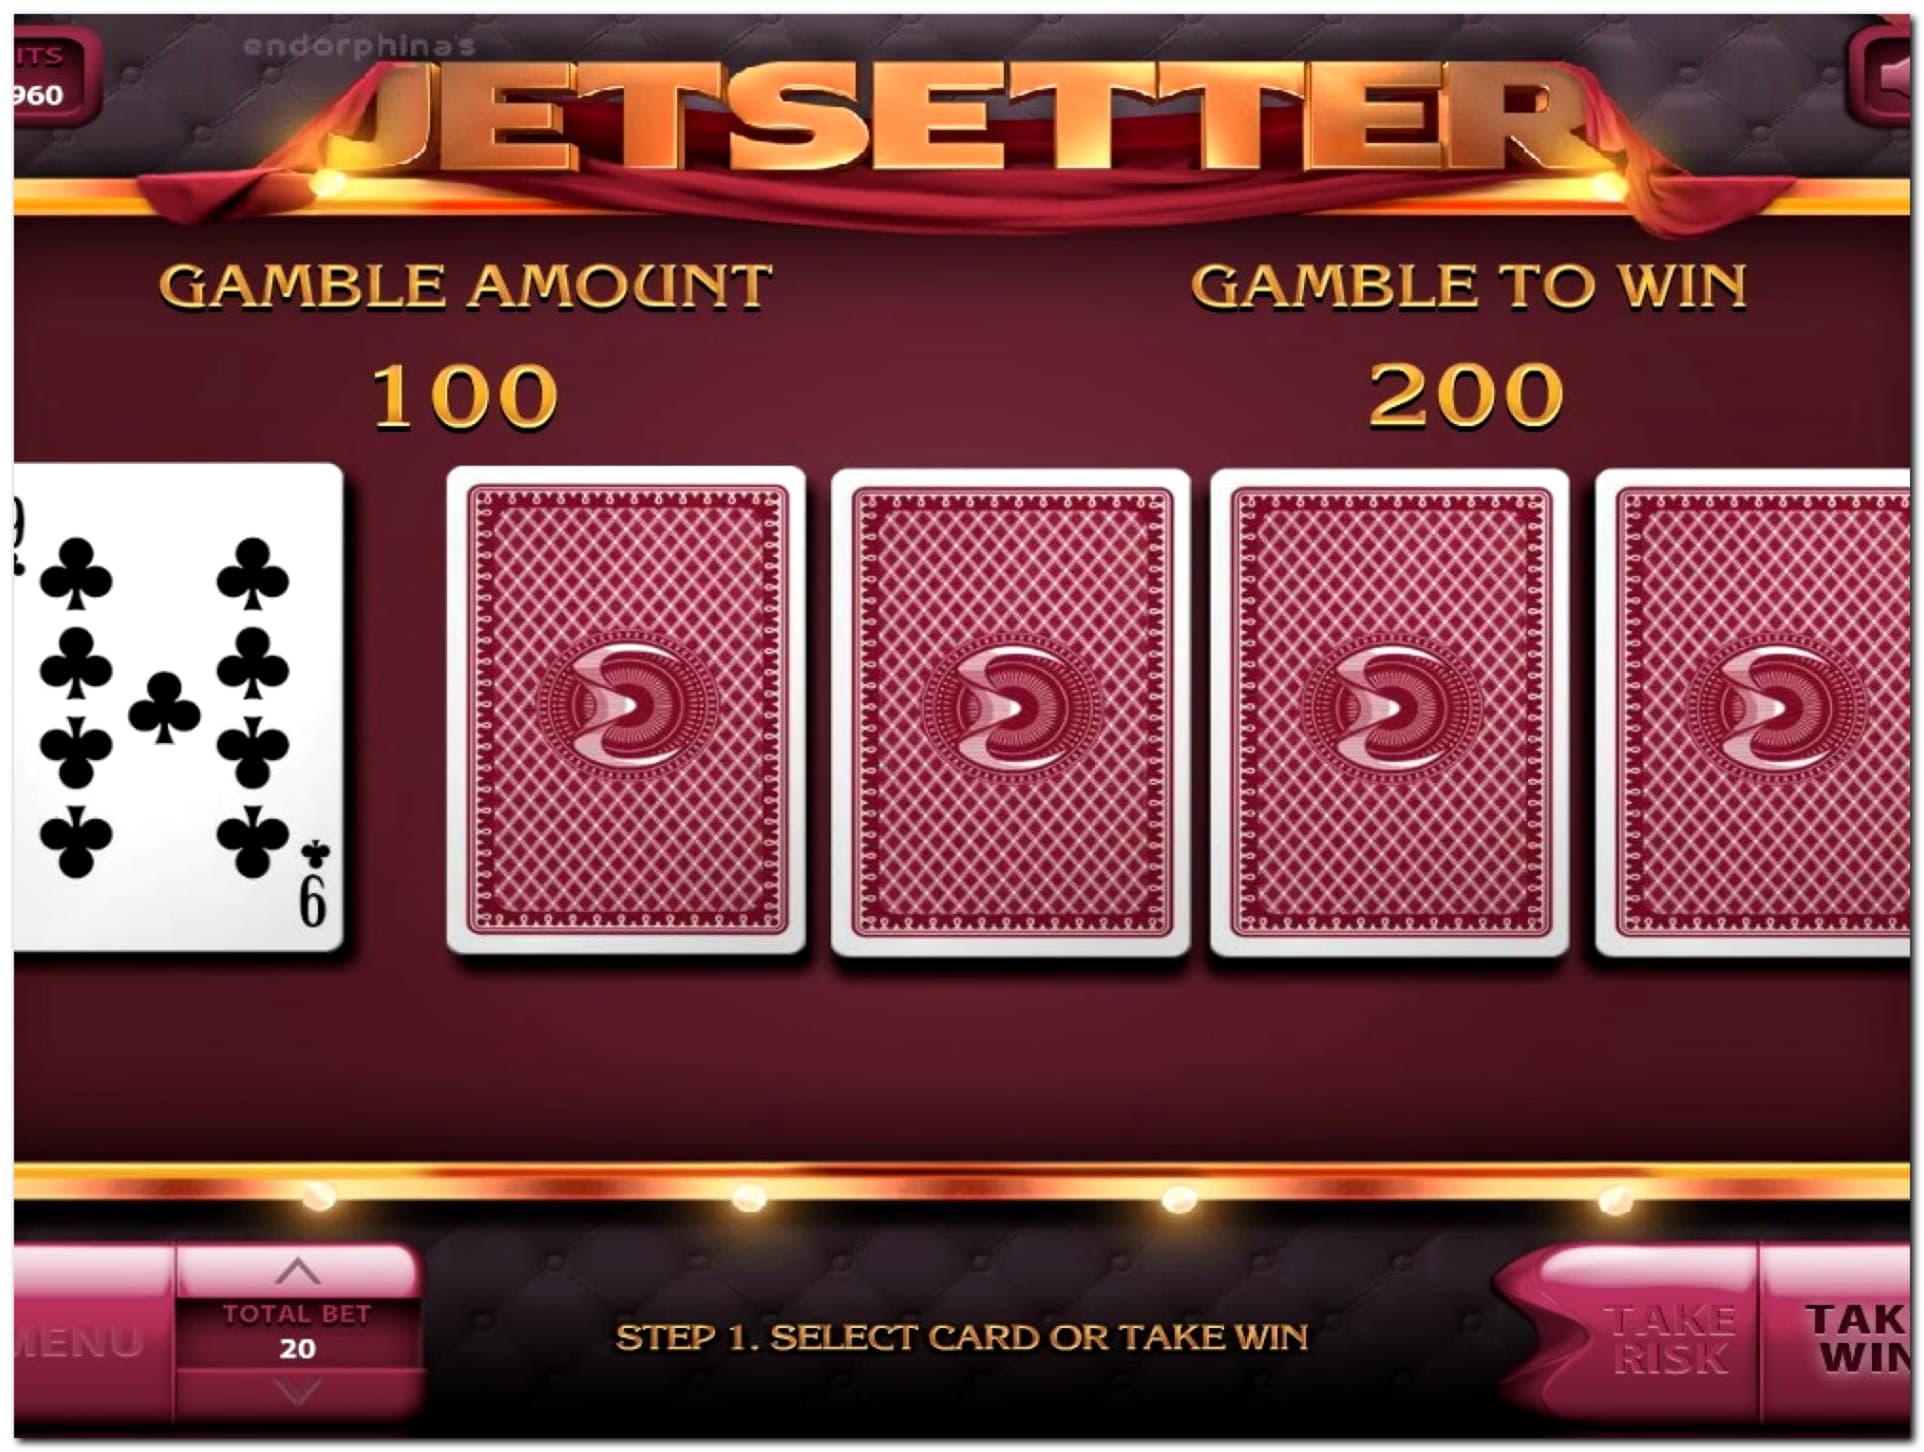 $420 Mobile freeroll slot tournament at Sloty Casino